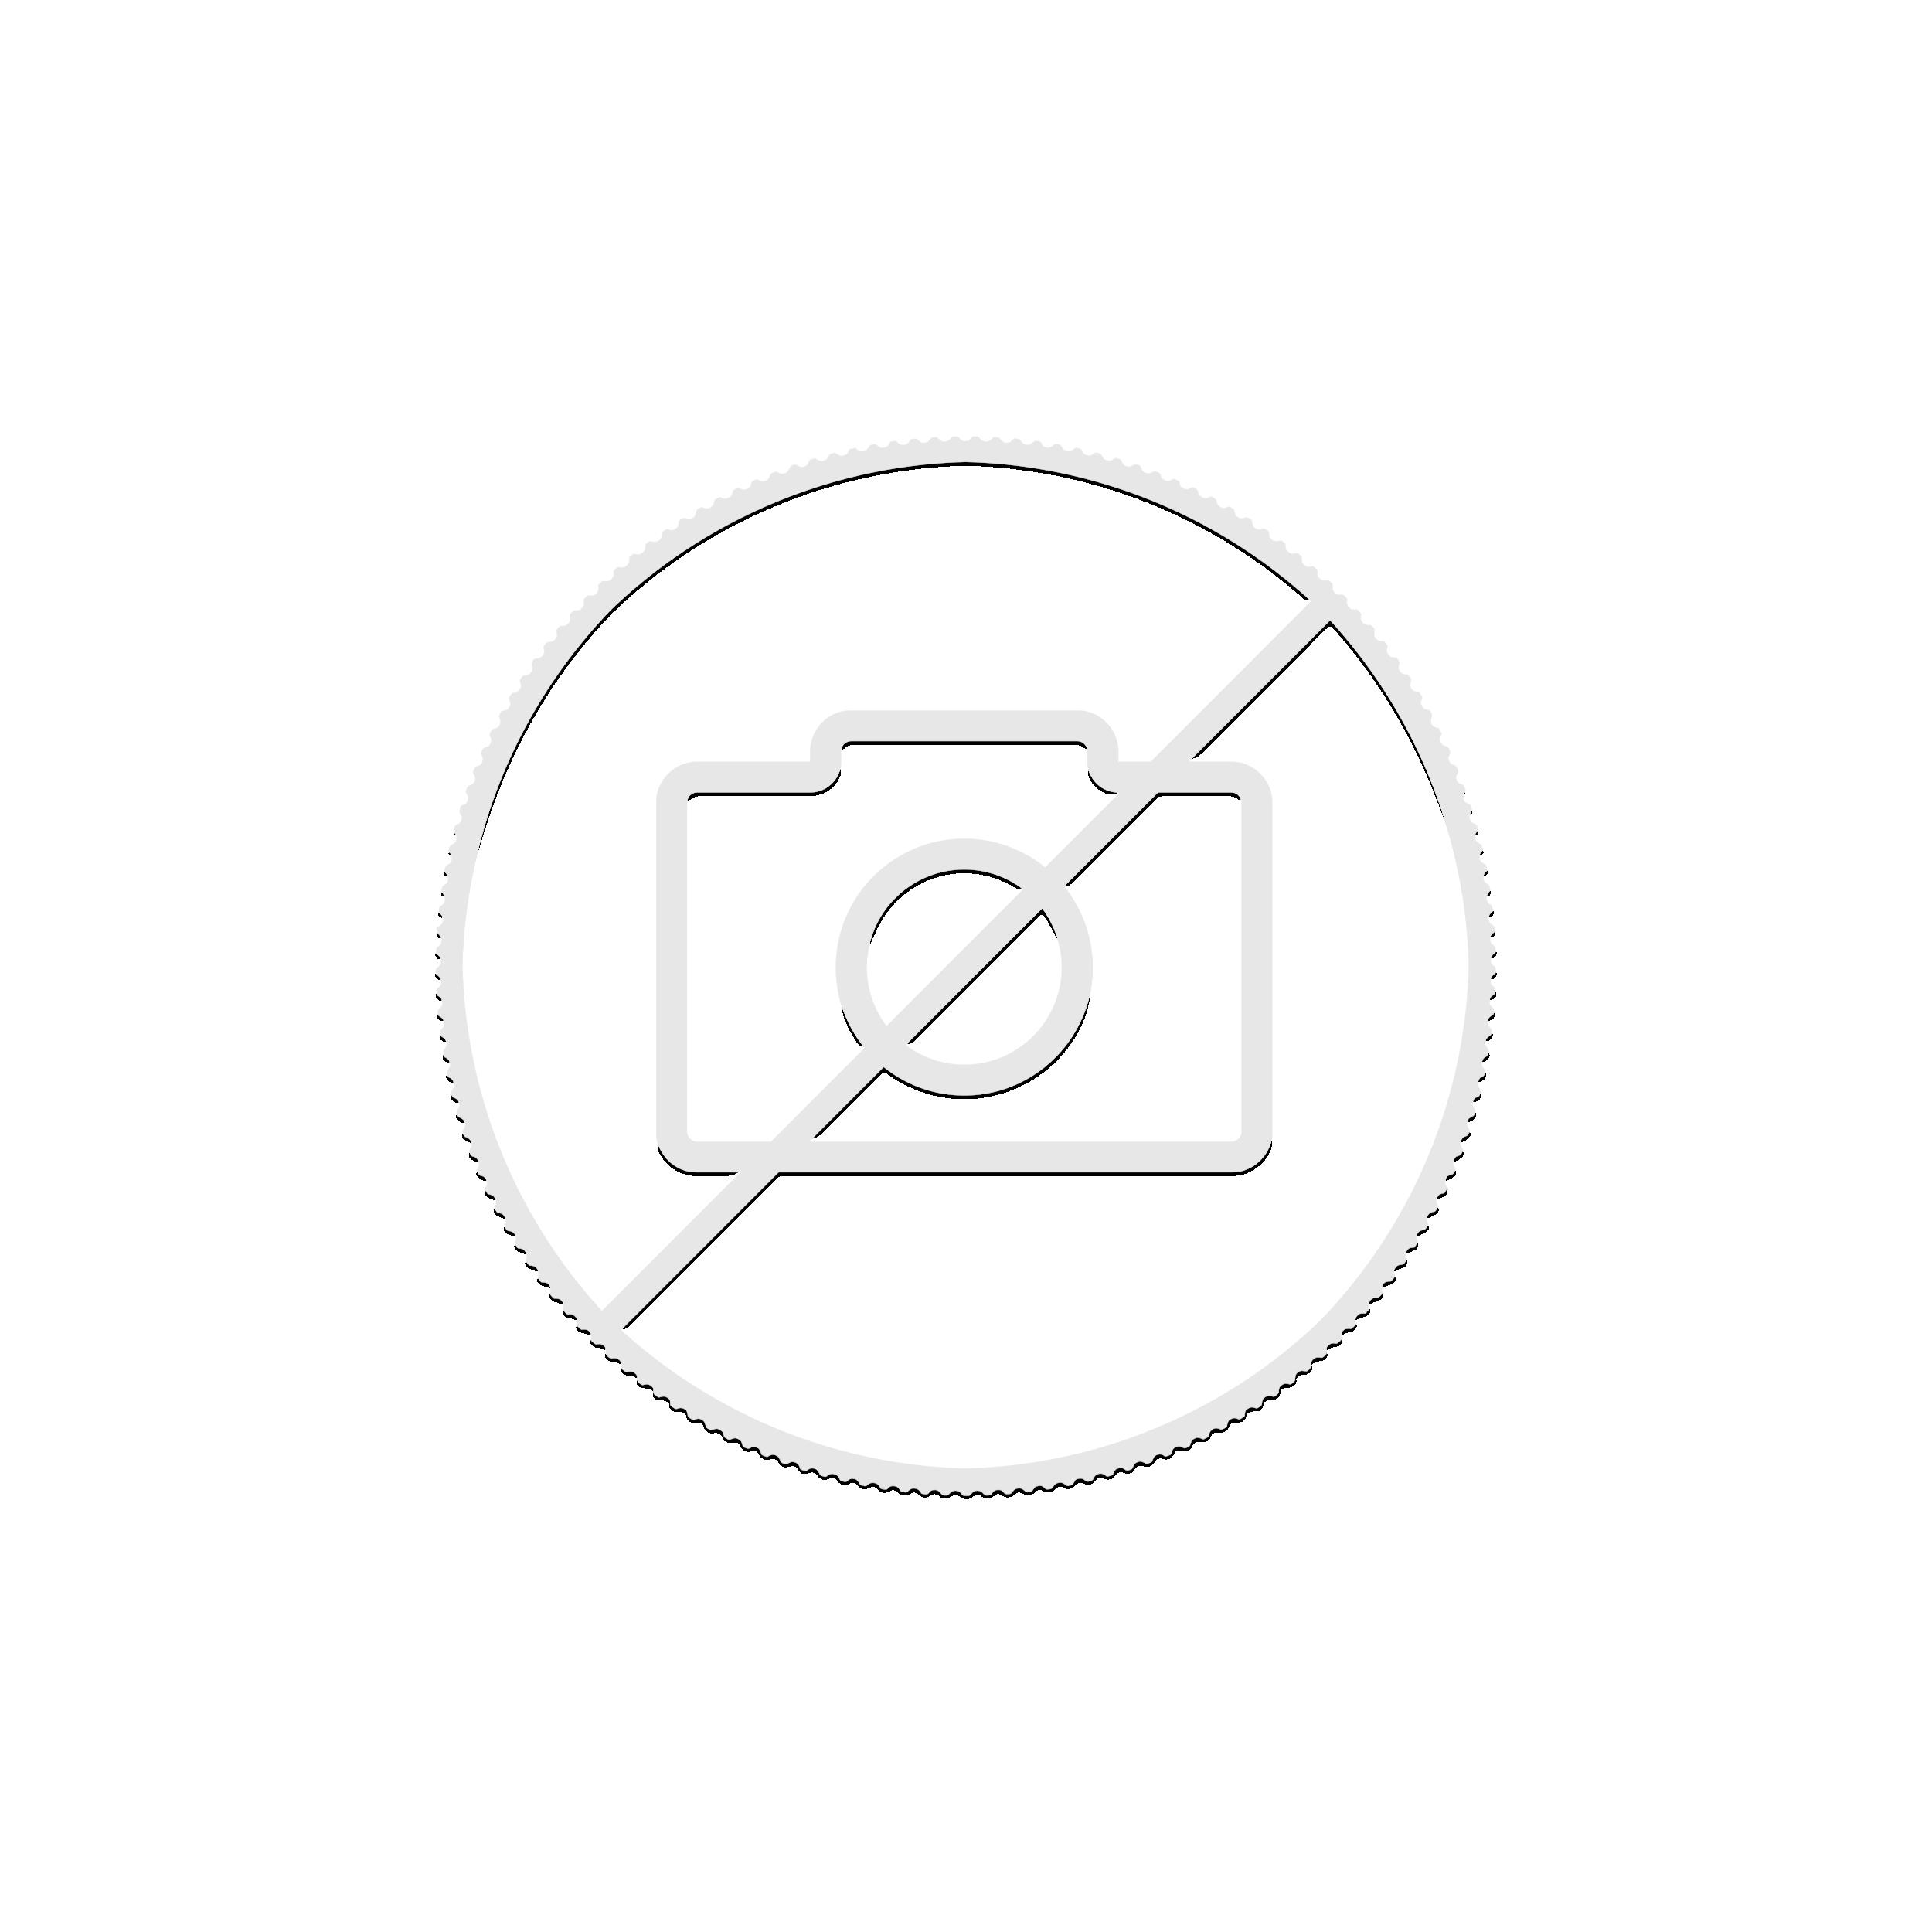 gouden Panda munt 1 troy ounce uit 1990